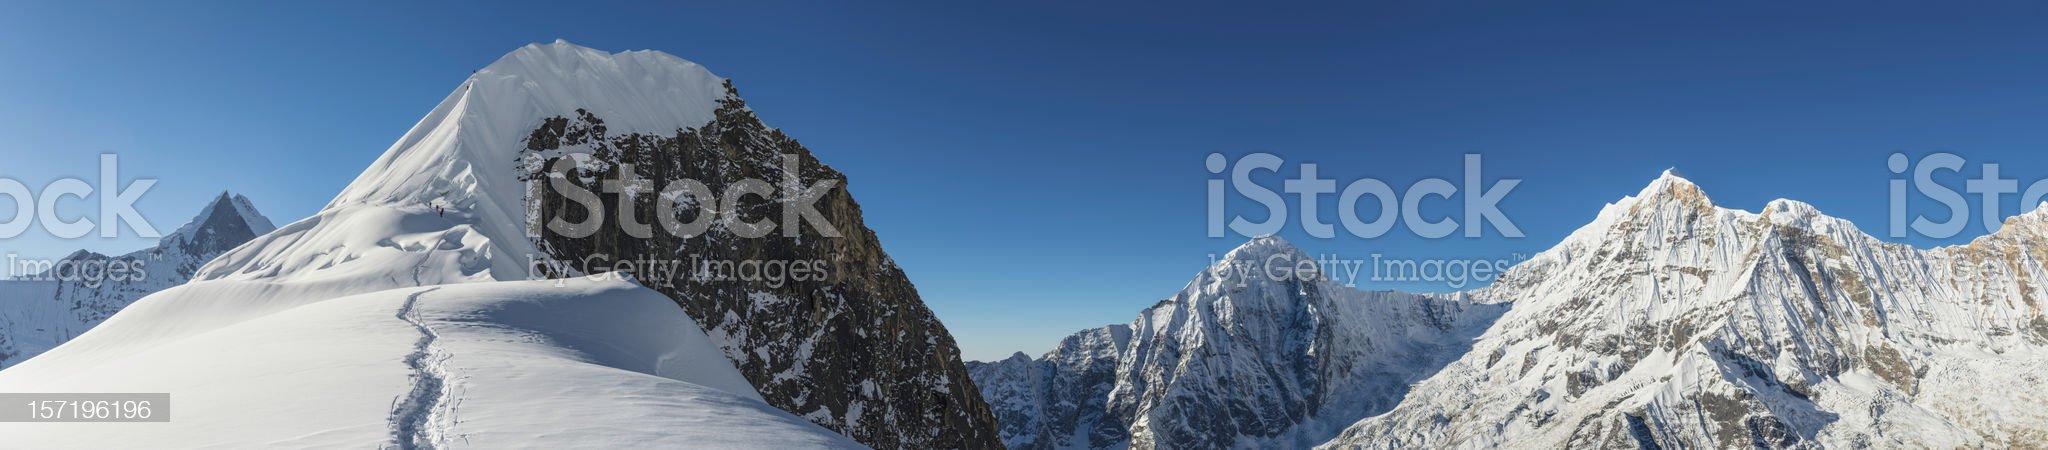 Mountaineers climbing Himalaya mountain peak Nepal royalty-free stock photo